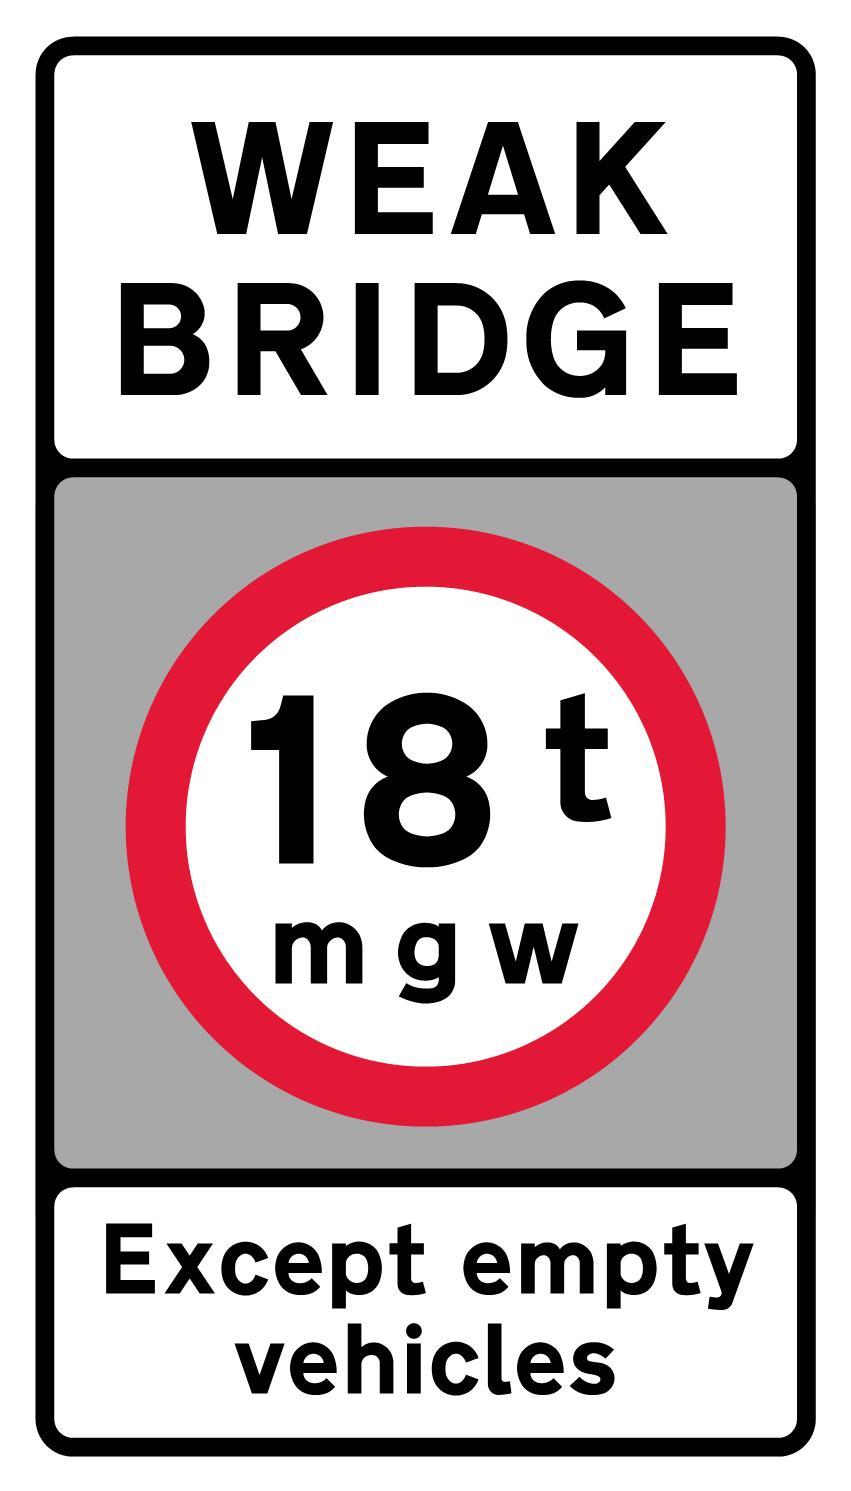 regulatory-signs - weak bridge